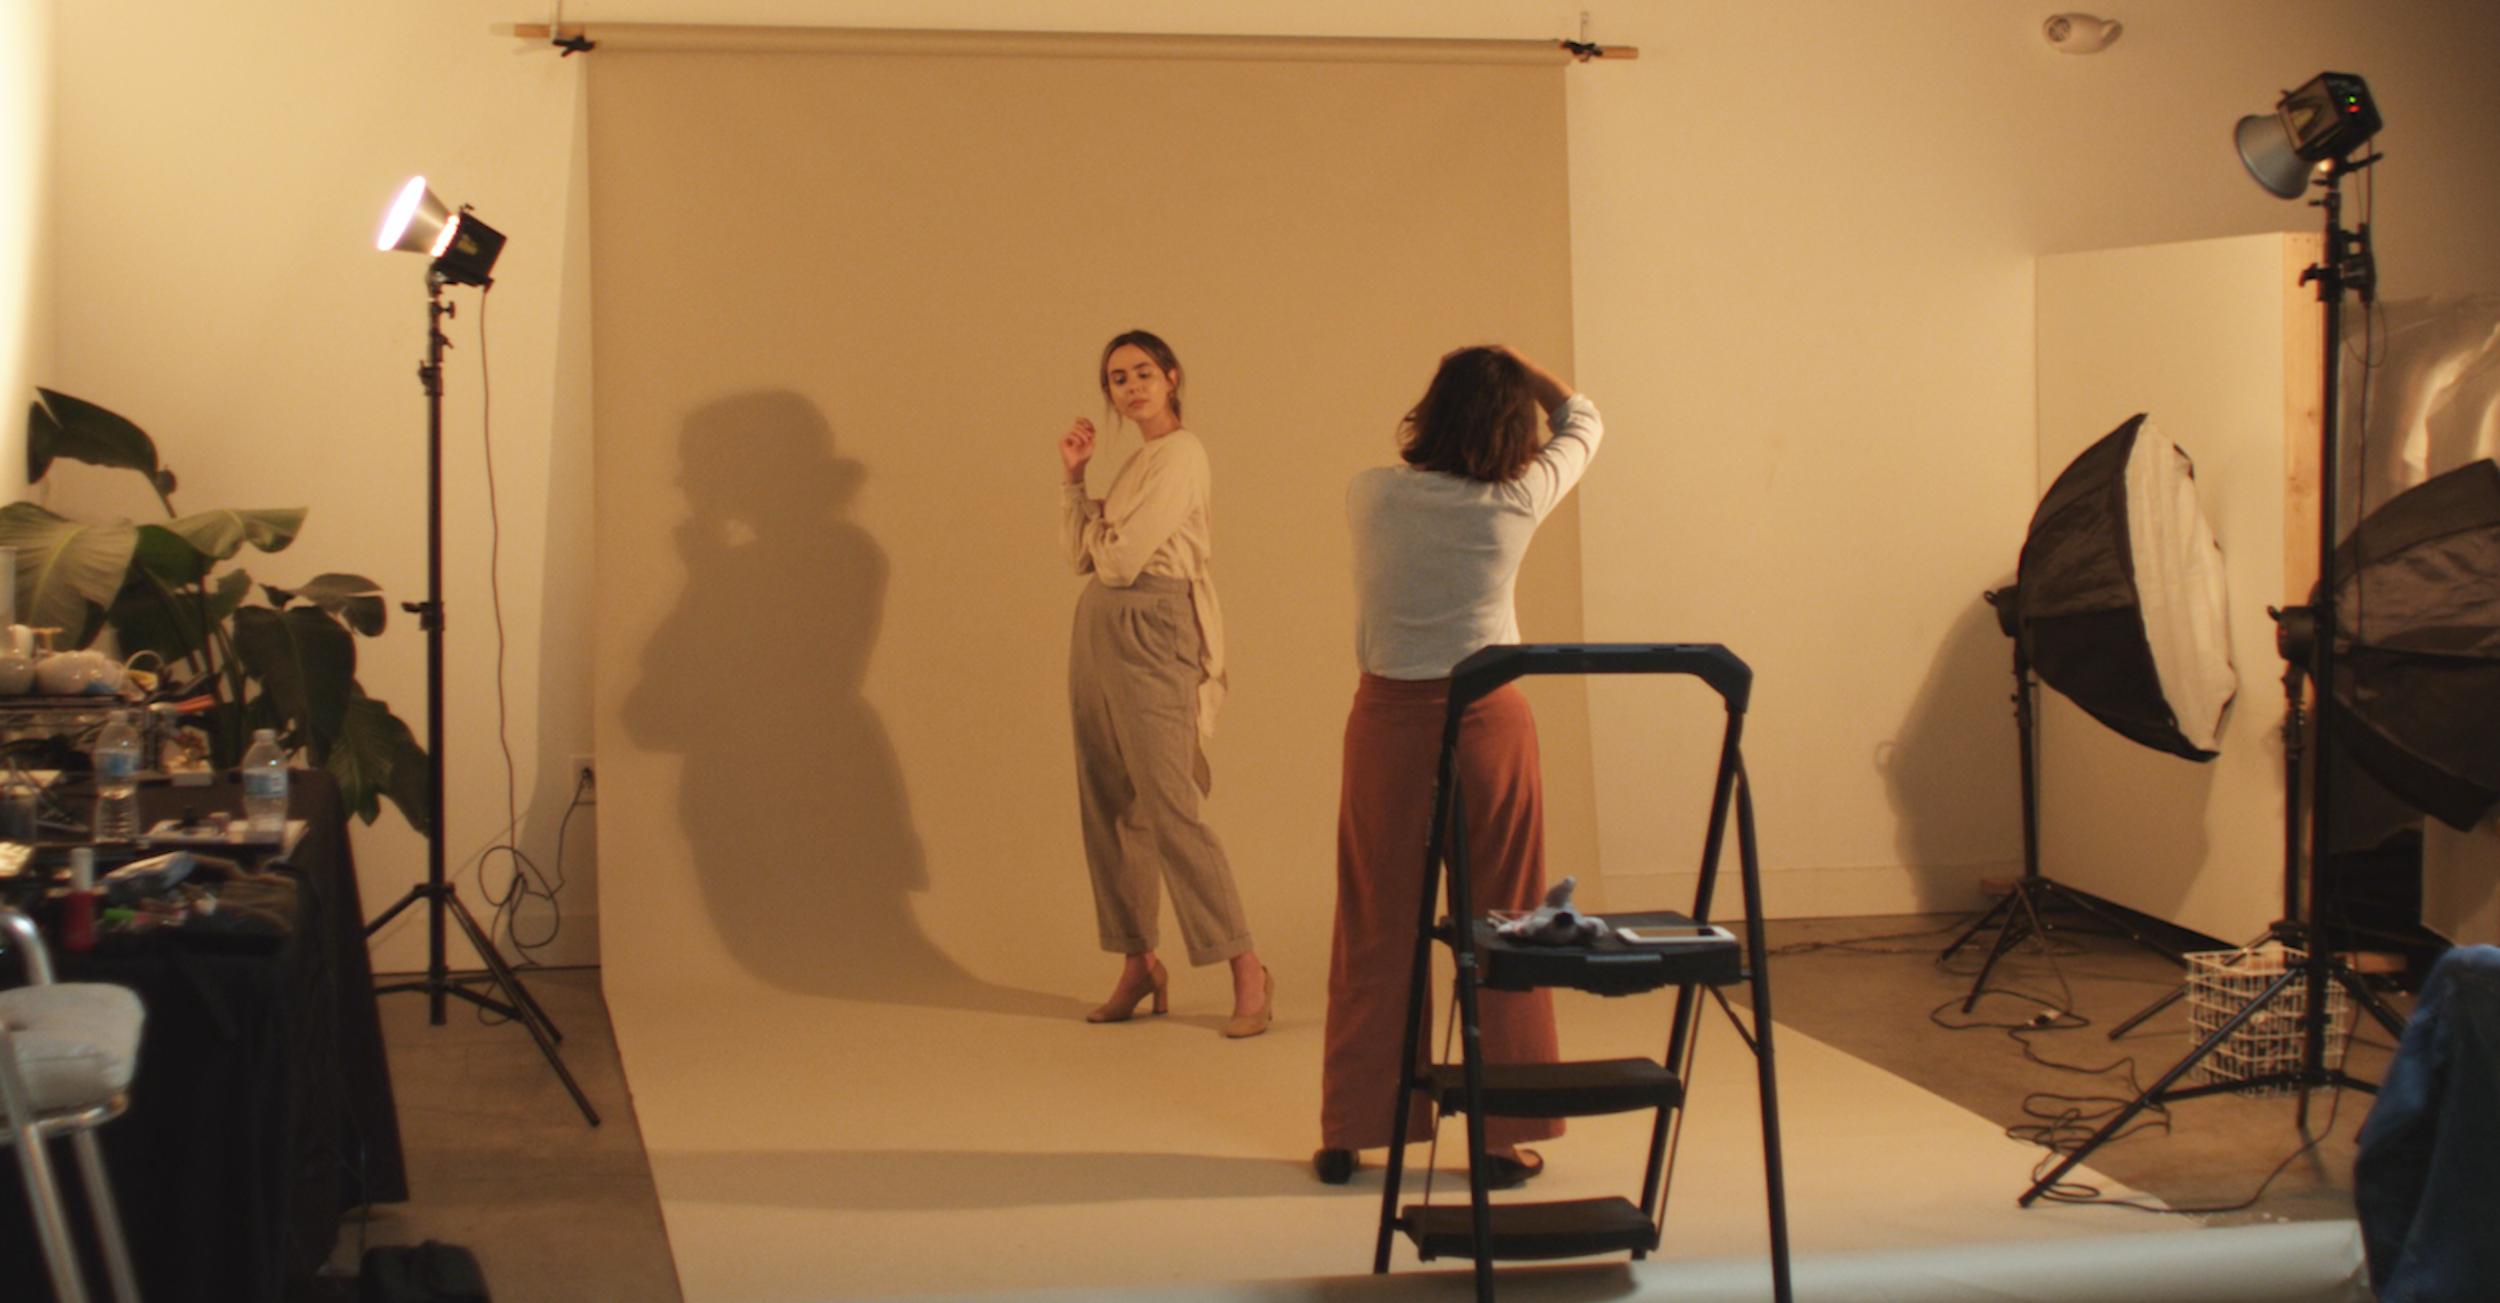 EMLEE DESIGN - IN STUDIO F/W 2018